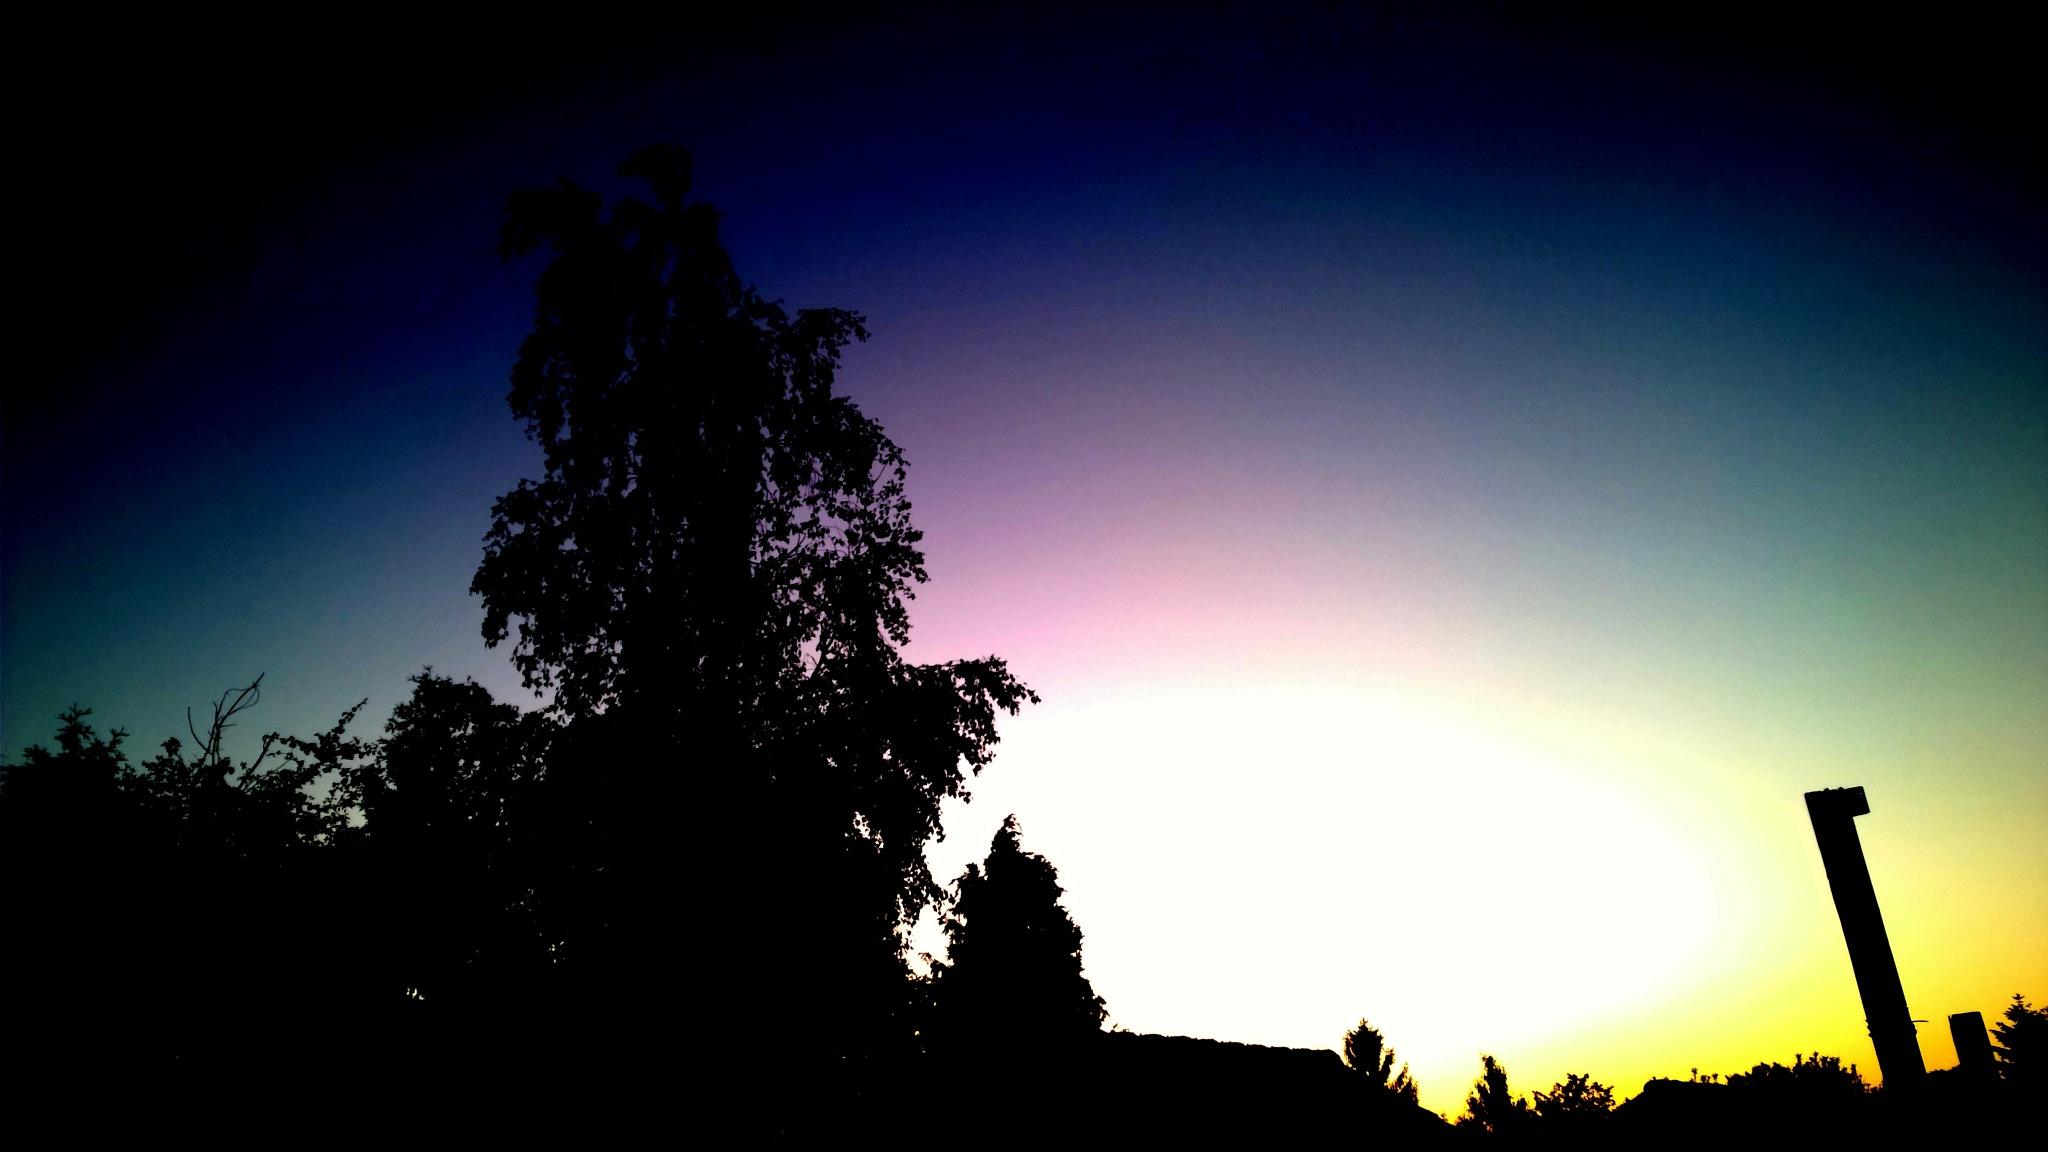 rainbow night by Lou Veen